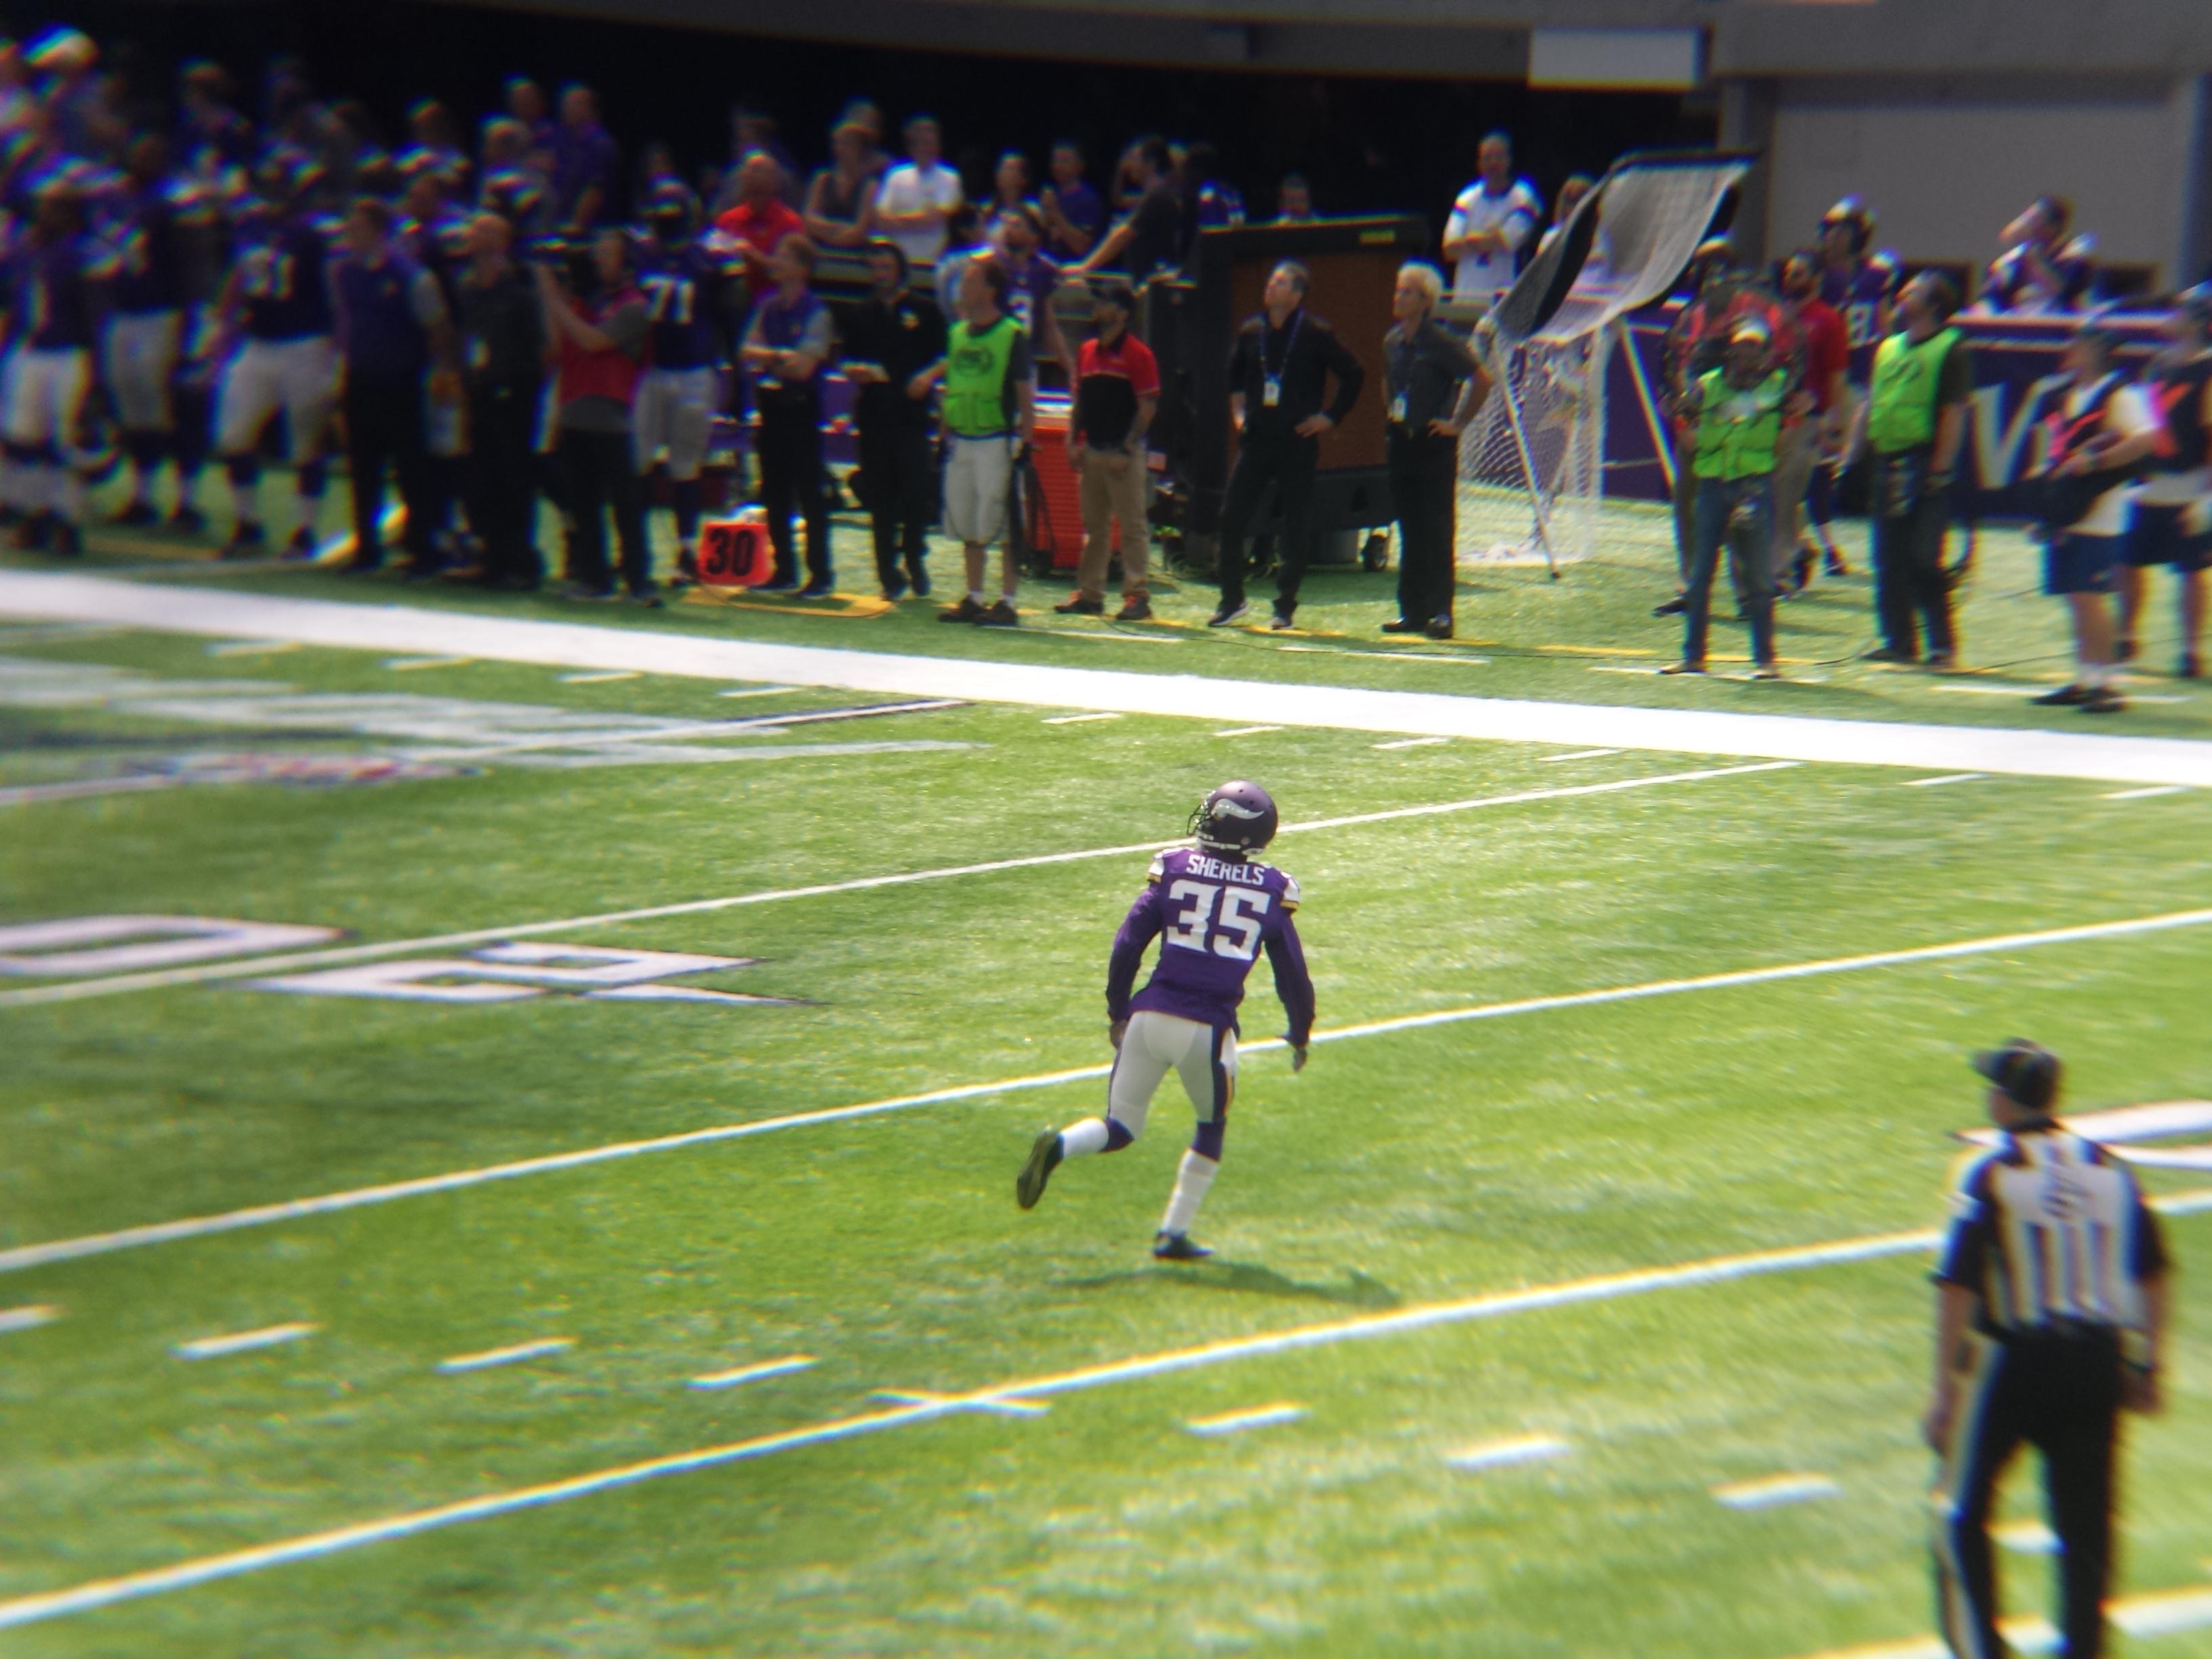 Minnesota Vikings U.S. Bank Stadium First Game - Marcus Sherels